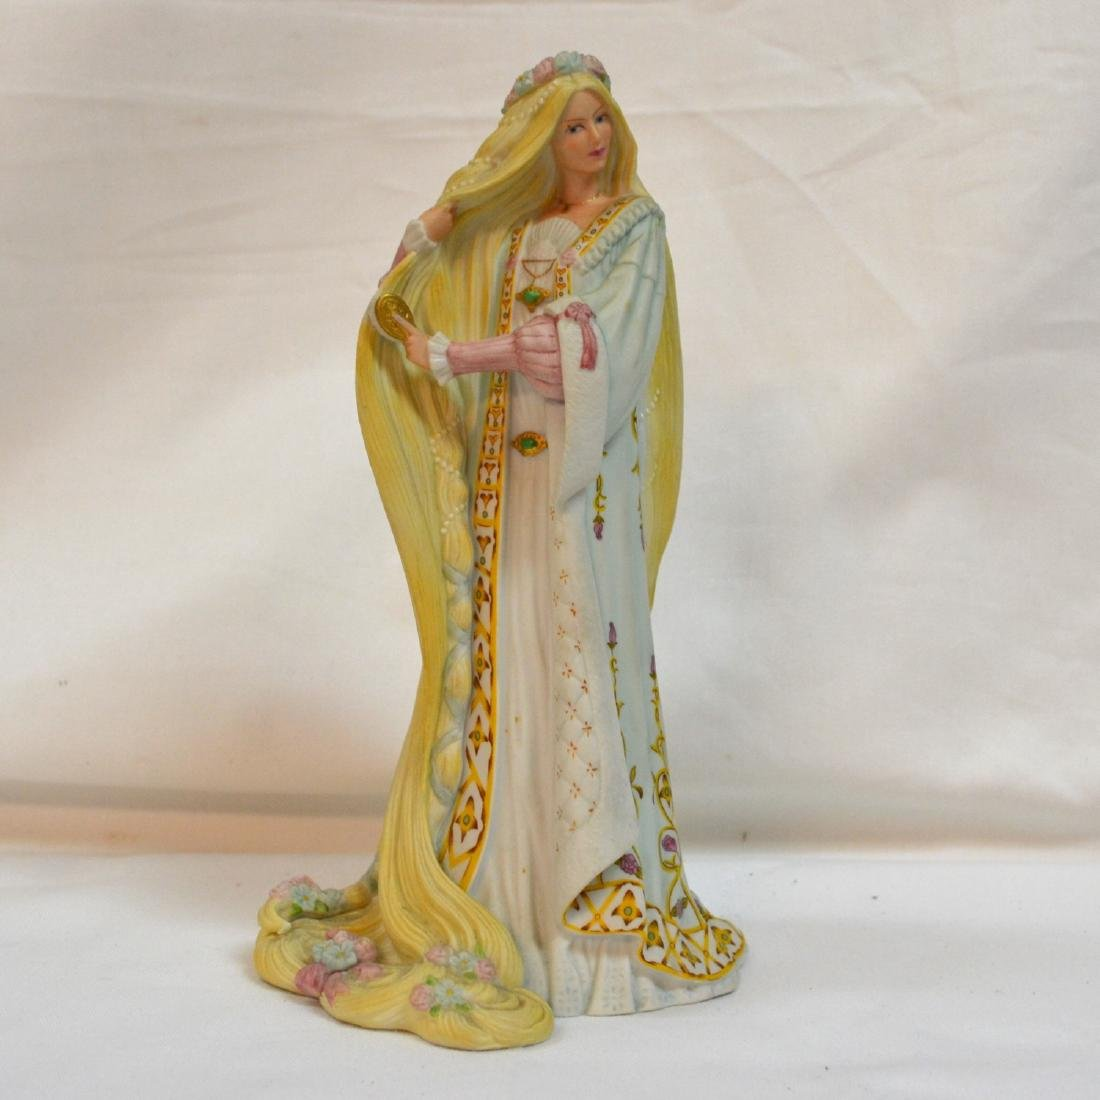 Lenox Legendary Princesses Rapunzel Figurine